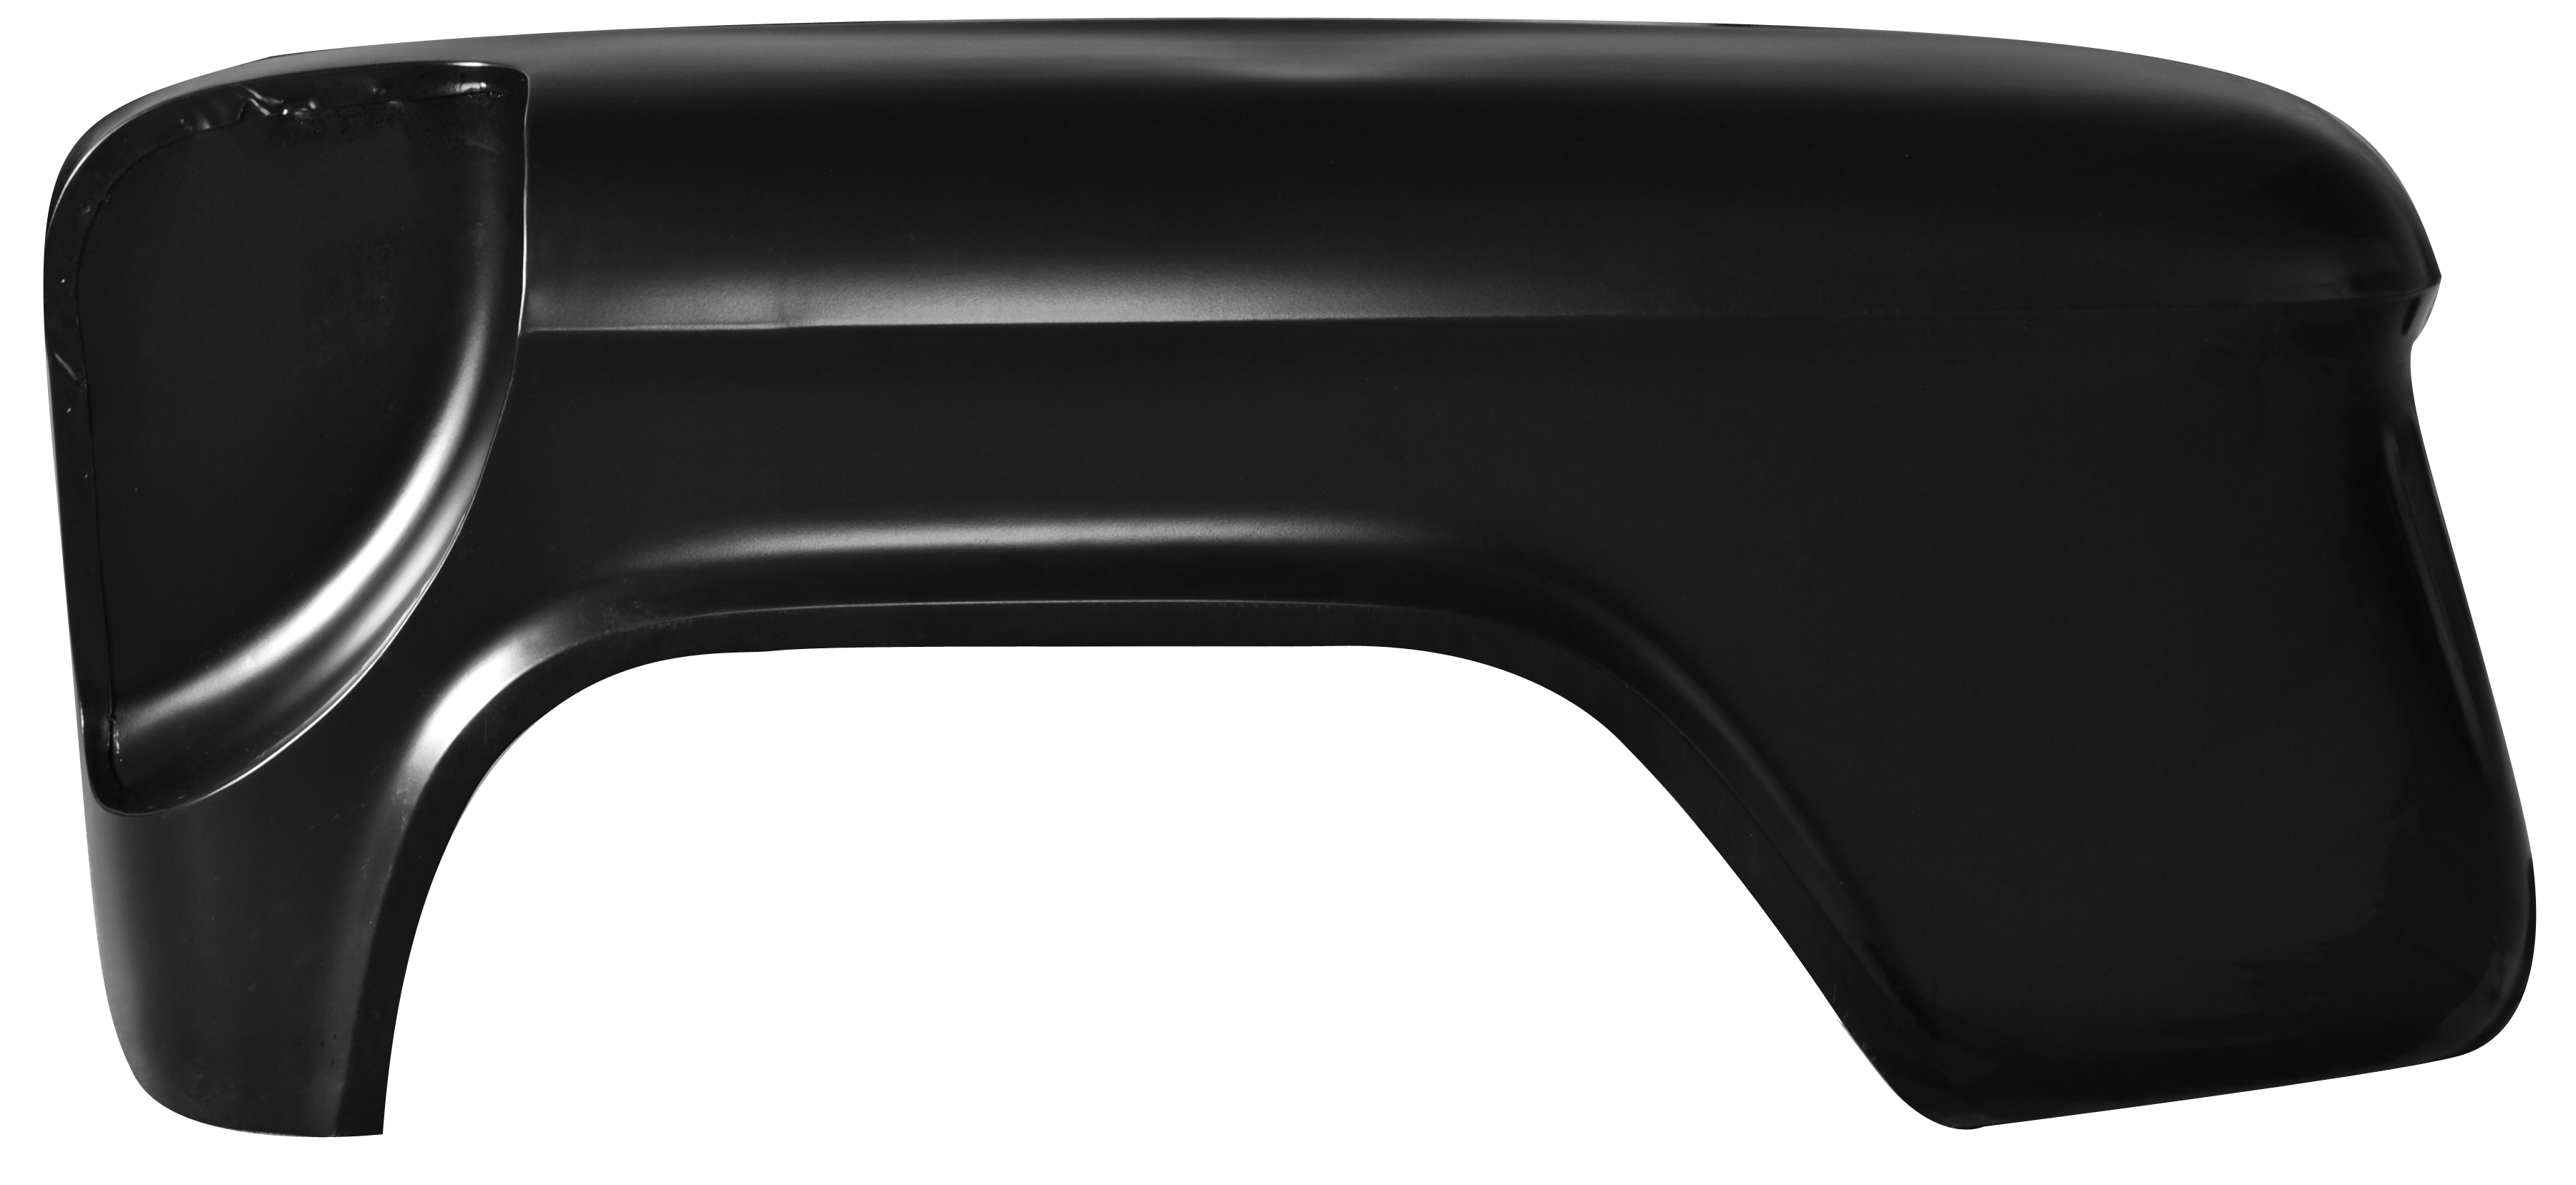 1955-66 C10 rear stepside fender w/spare tire cutout, longbed, lt